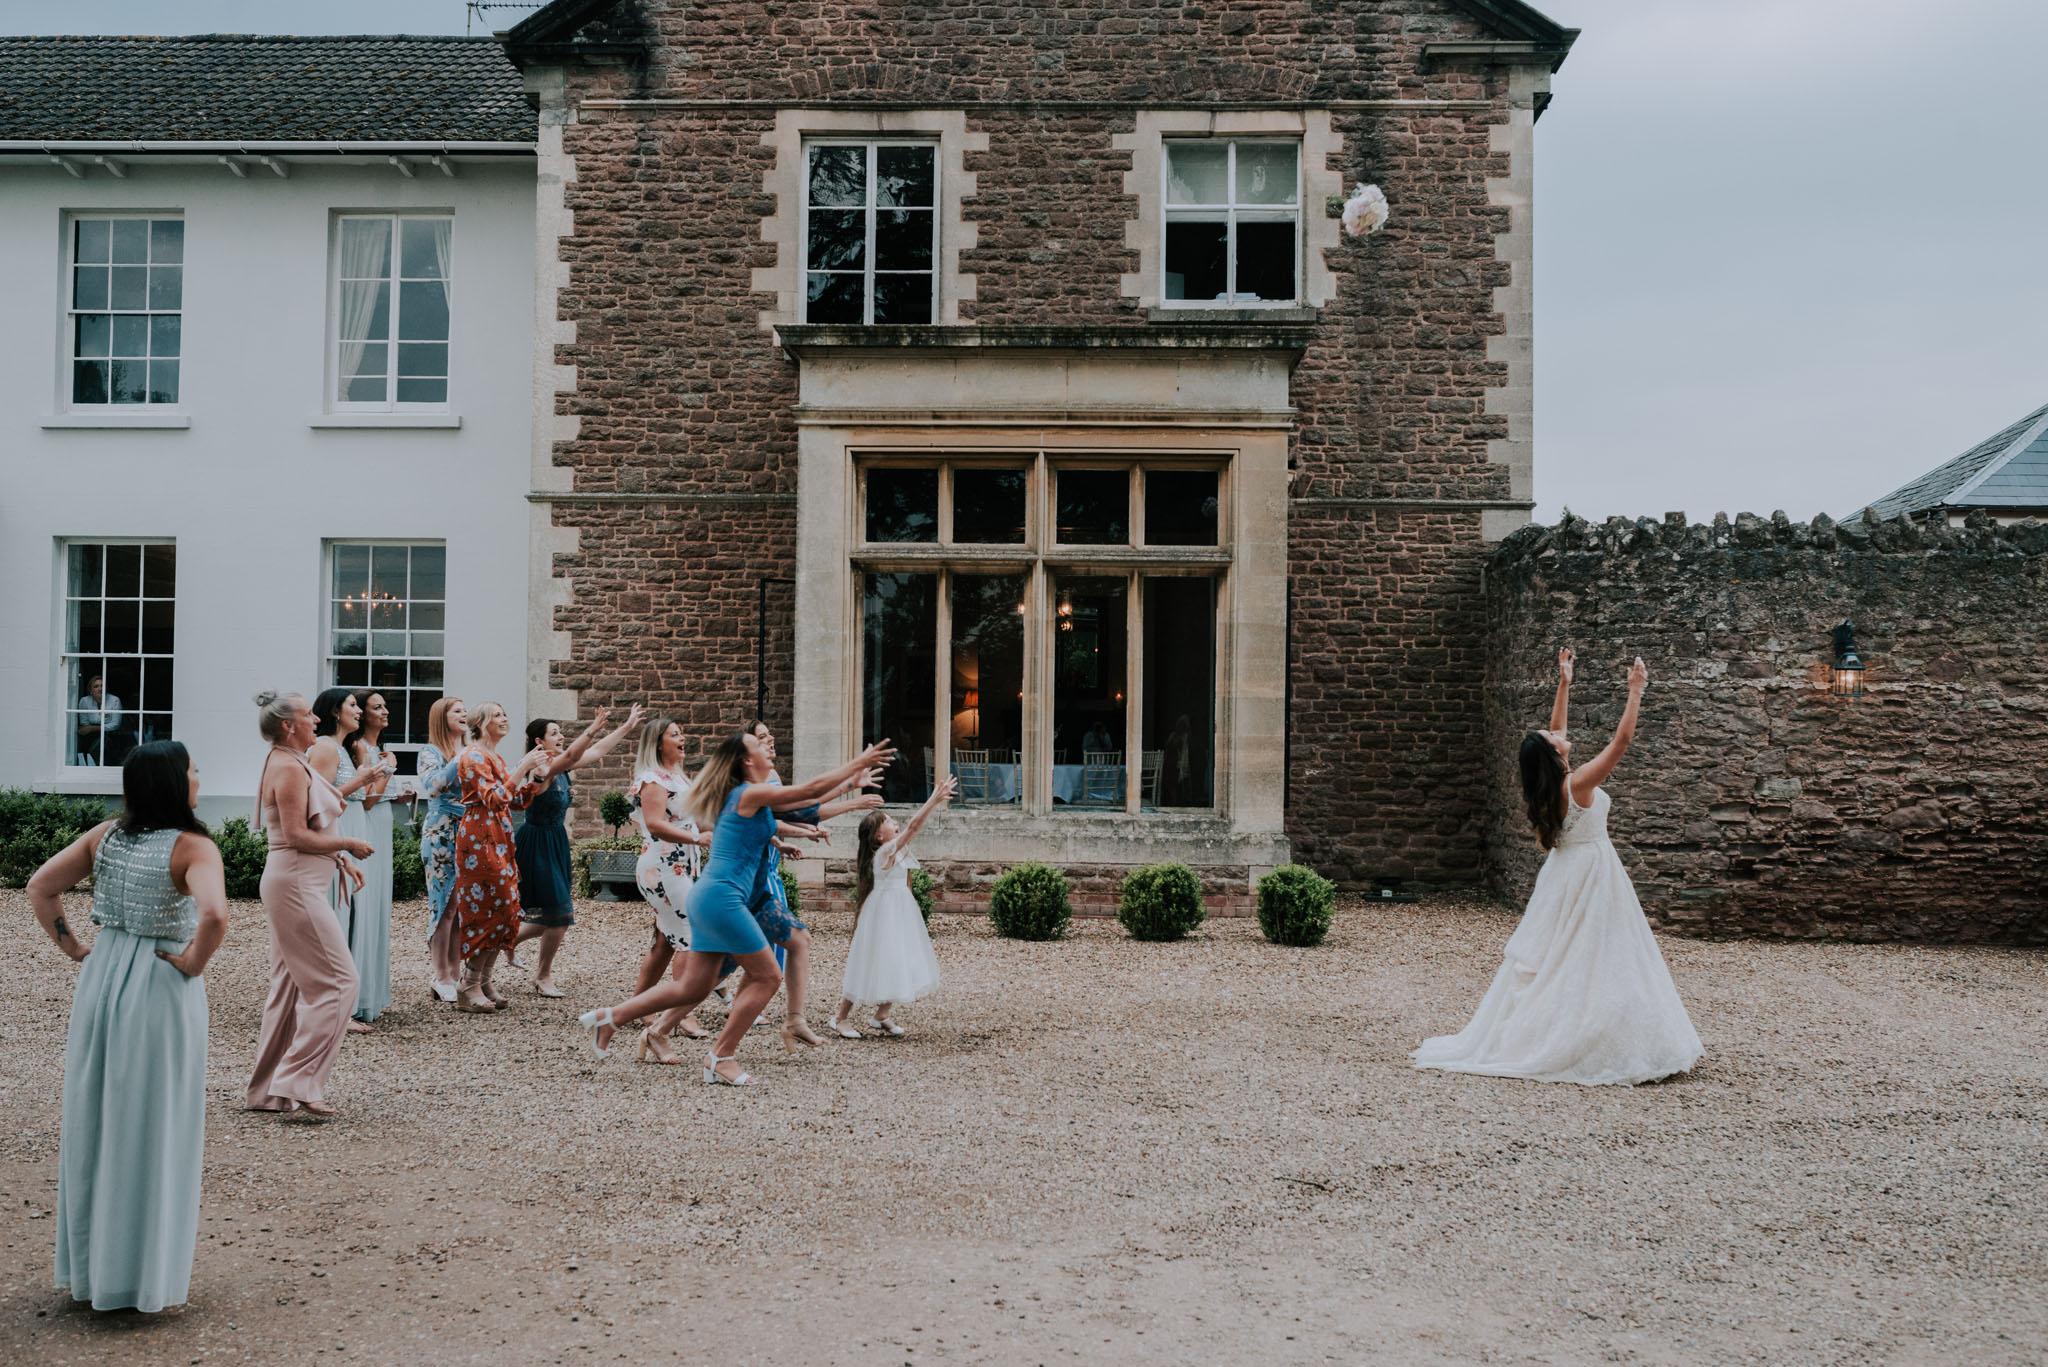 wedding-photographer-glewstone-court-hereford-scott-stockwell-photography465.jpg